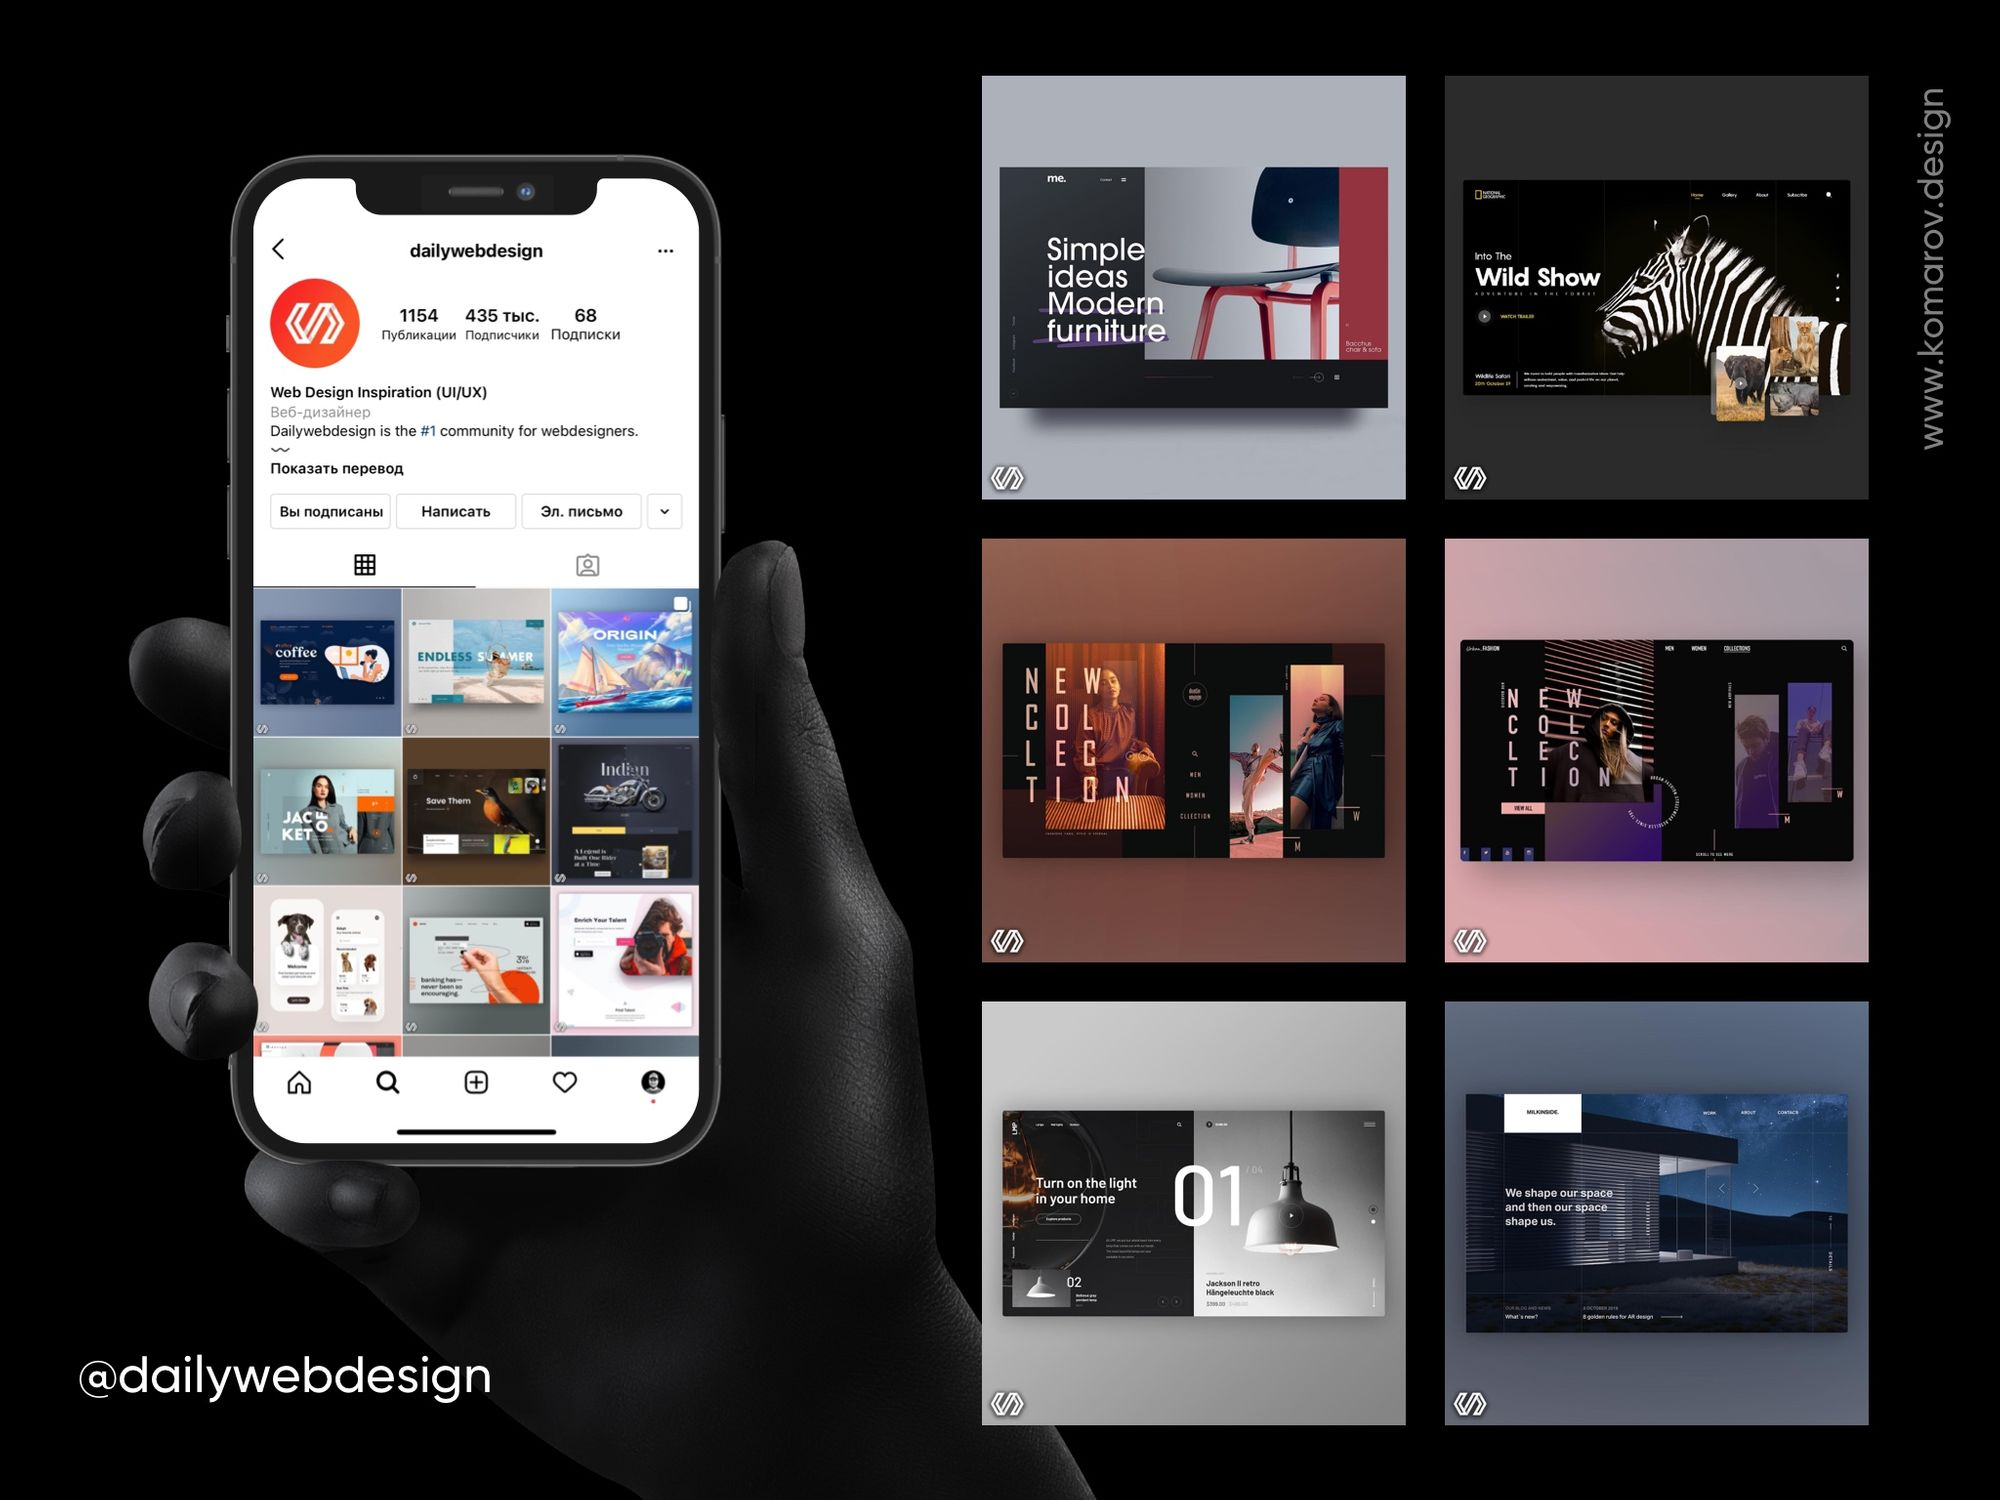 Инстаграм-аккаунт об UI/UX и Webdesign